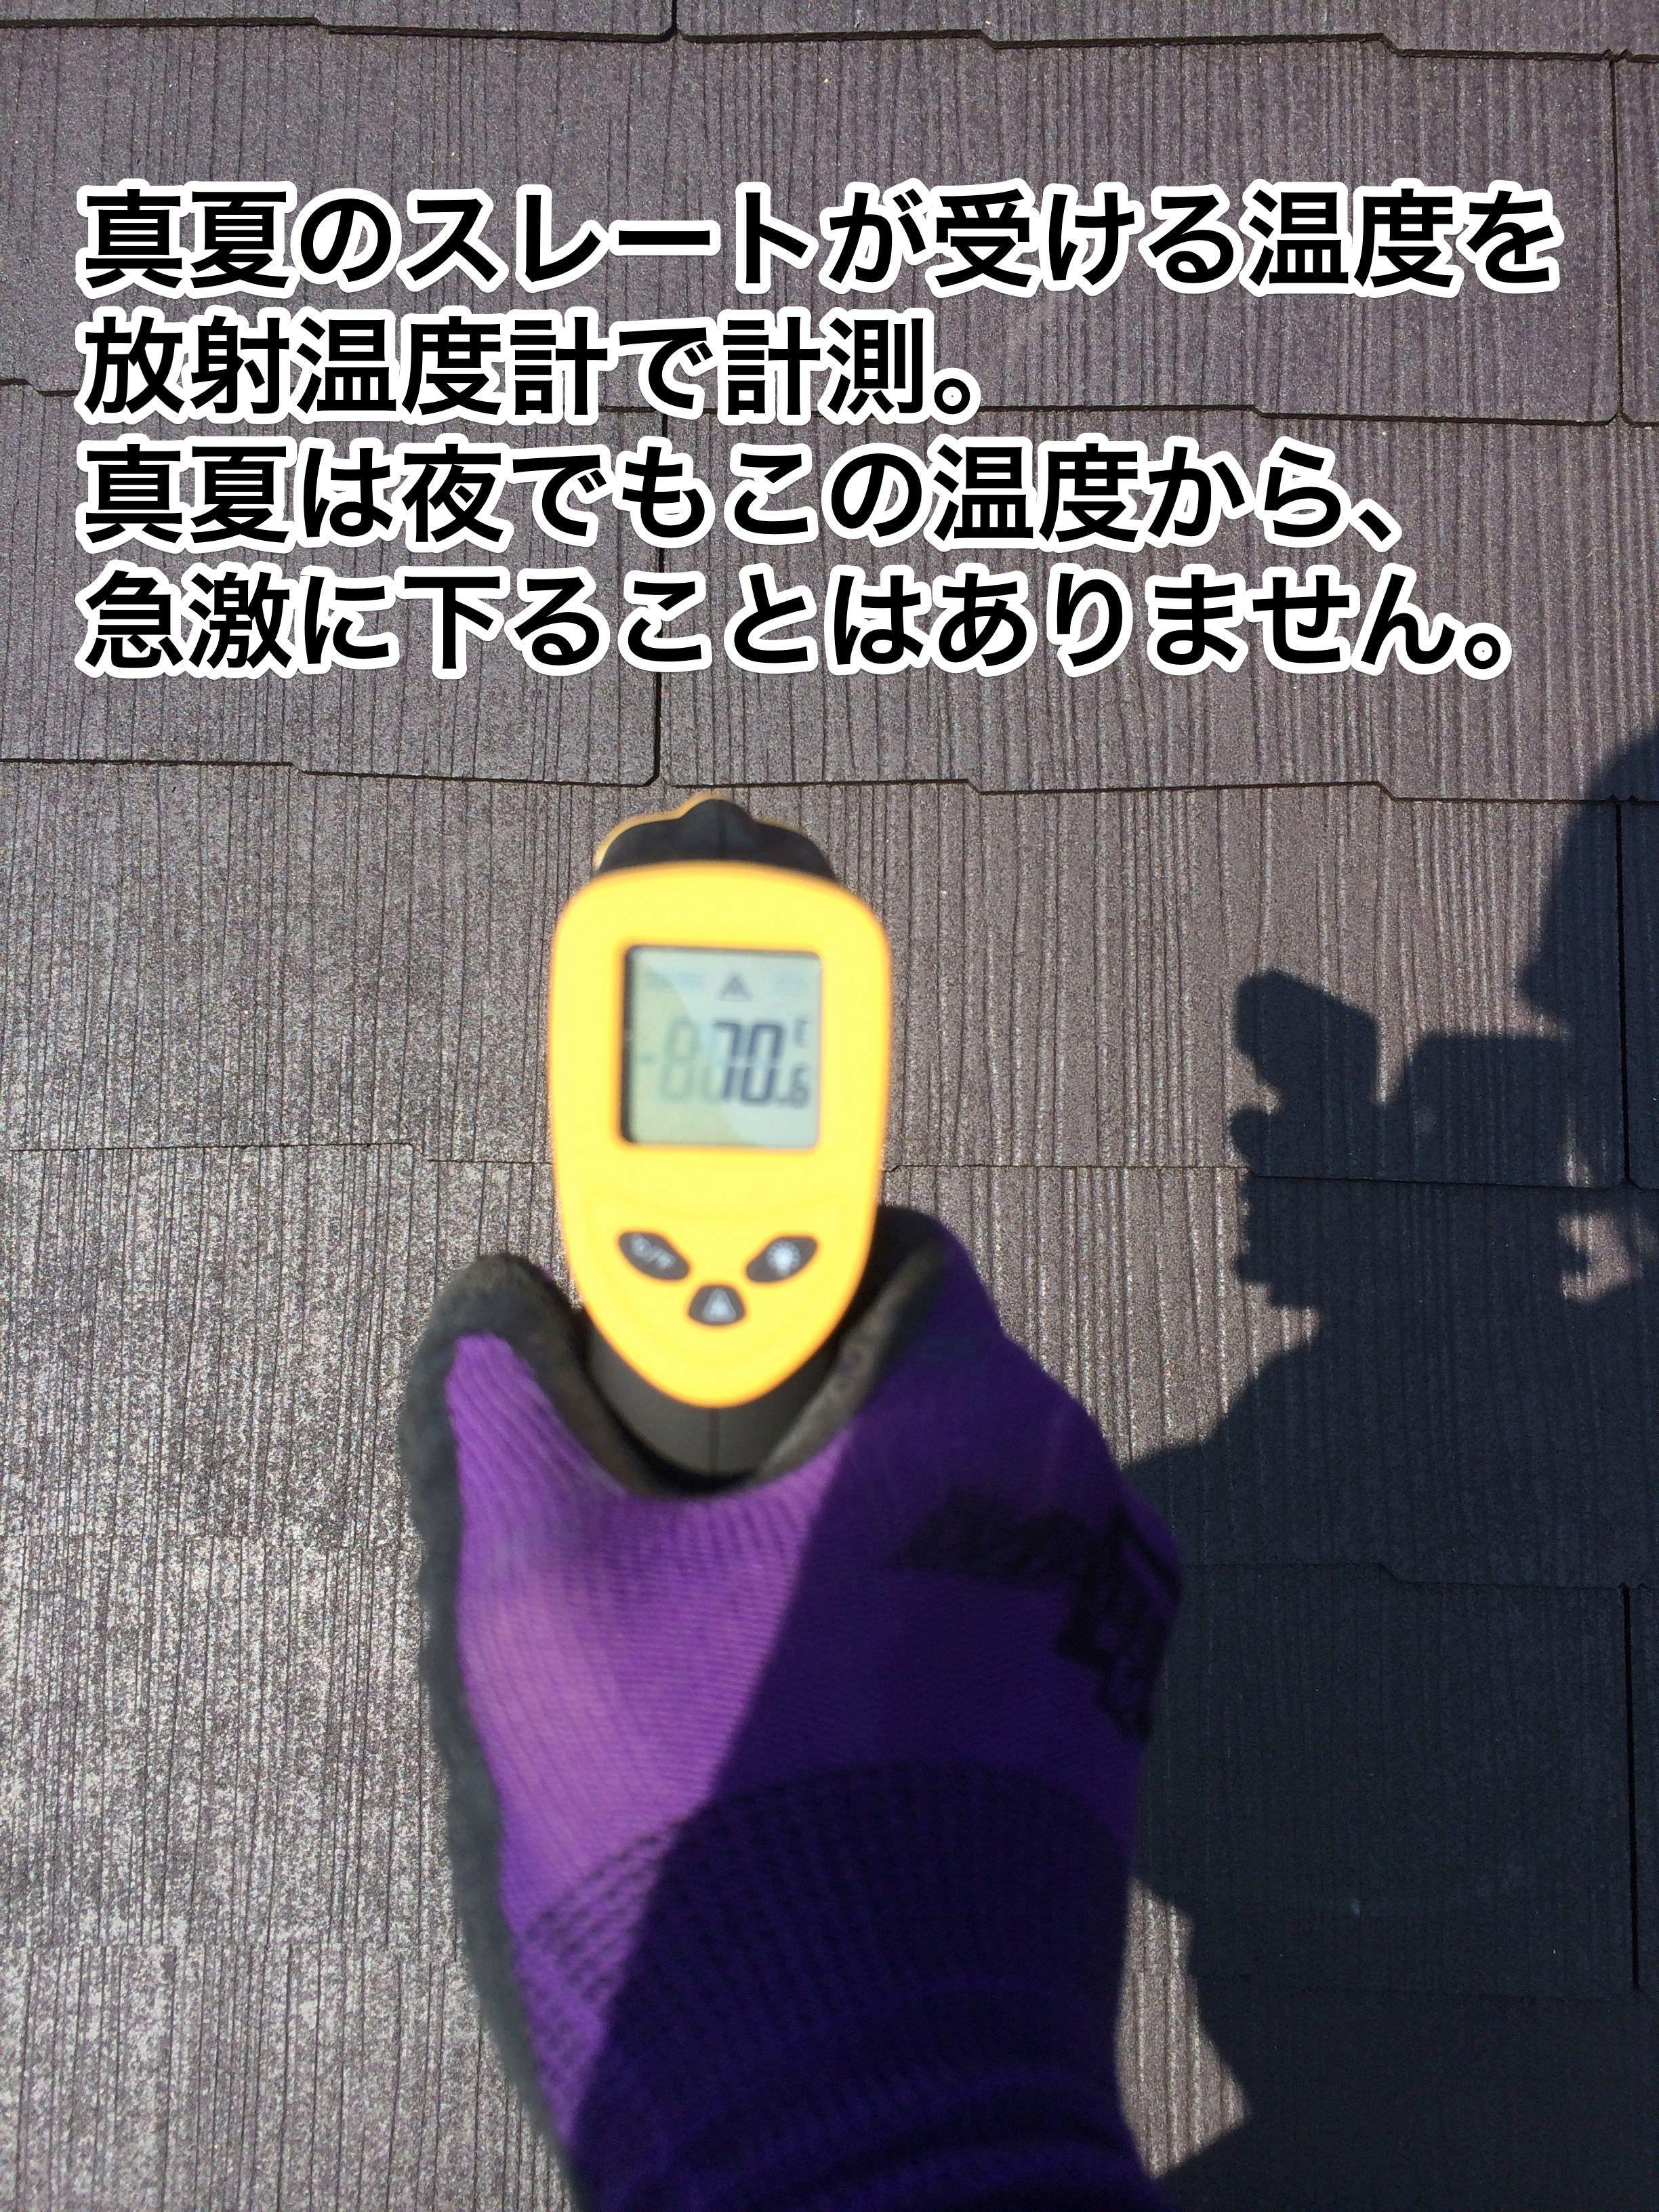 写真_2014-07-26_9_25_46